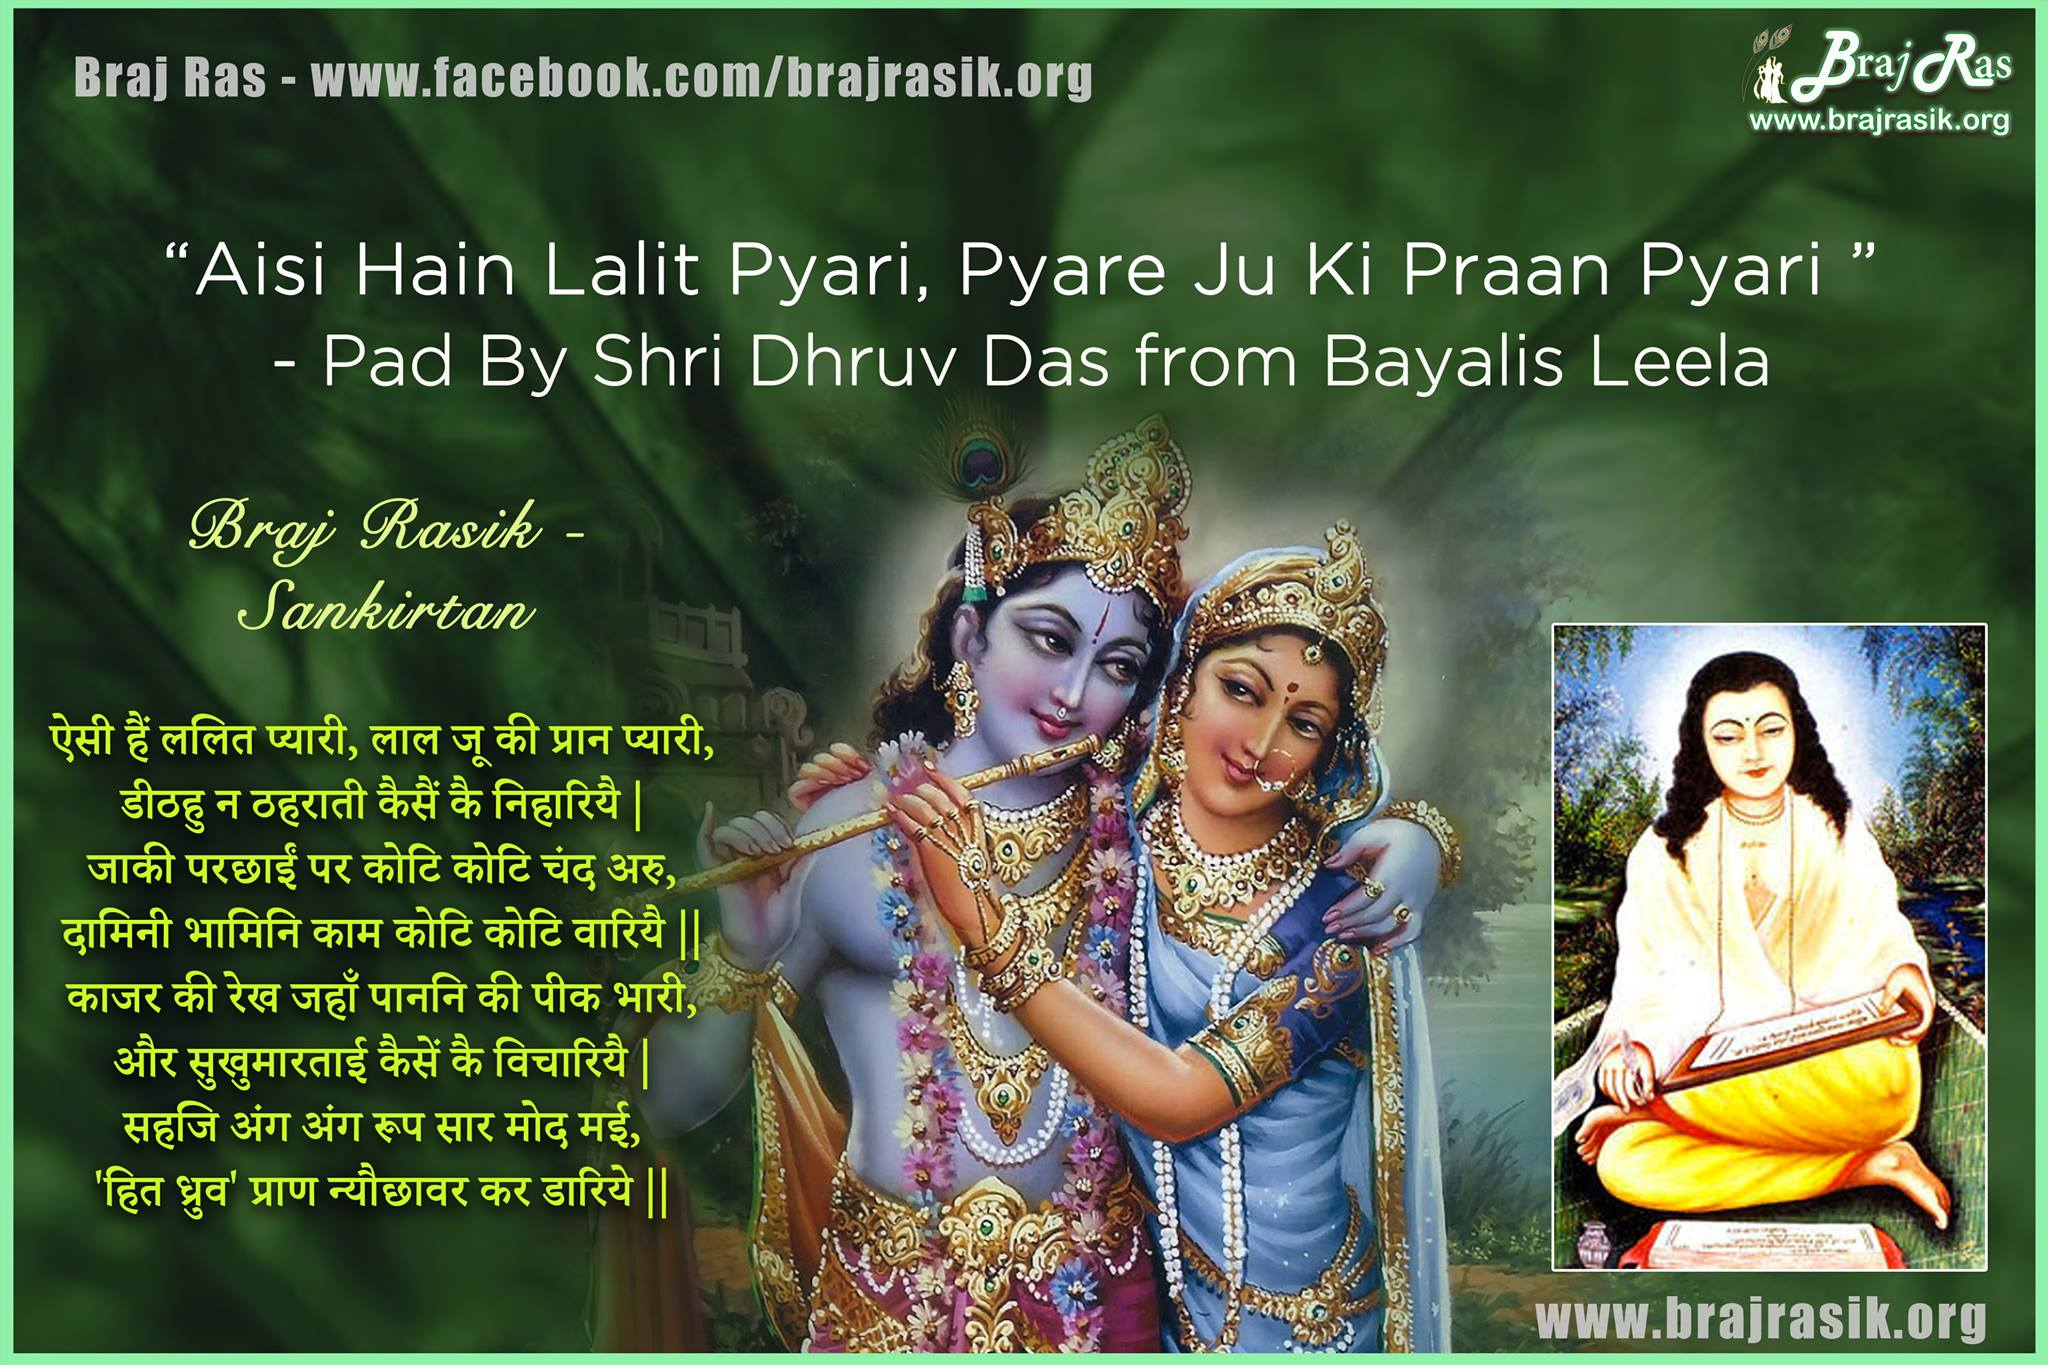 Aisi Hain Lalit Pyaari, Laal Joo Kee Praan Pyaari - Pad Written By Shri Dhruvdas